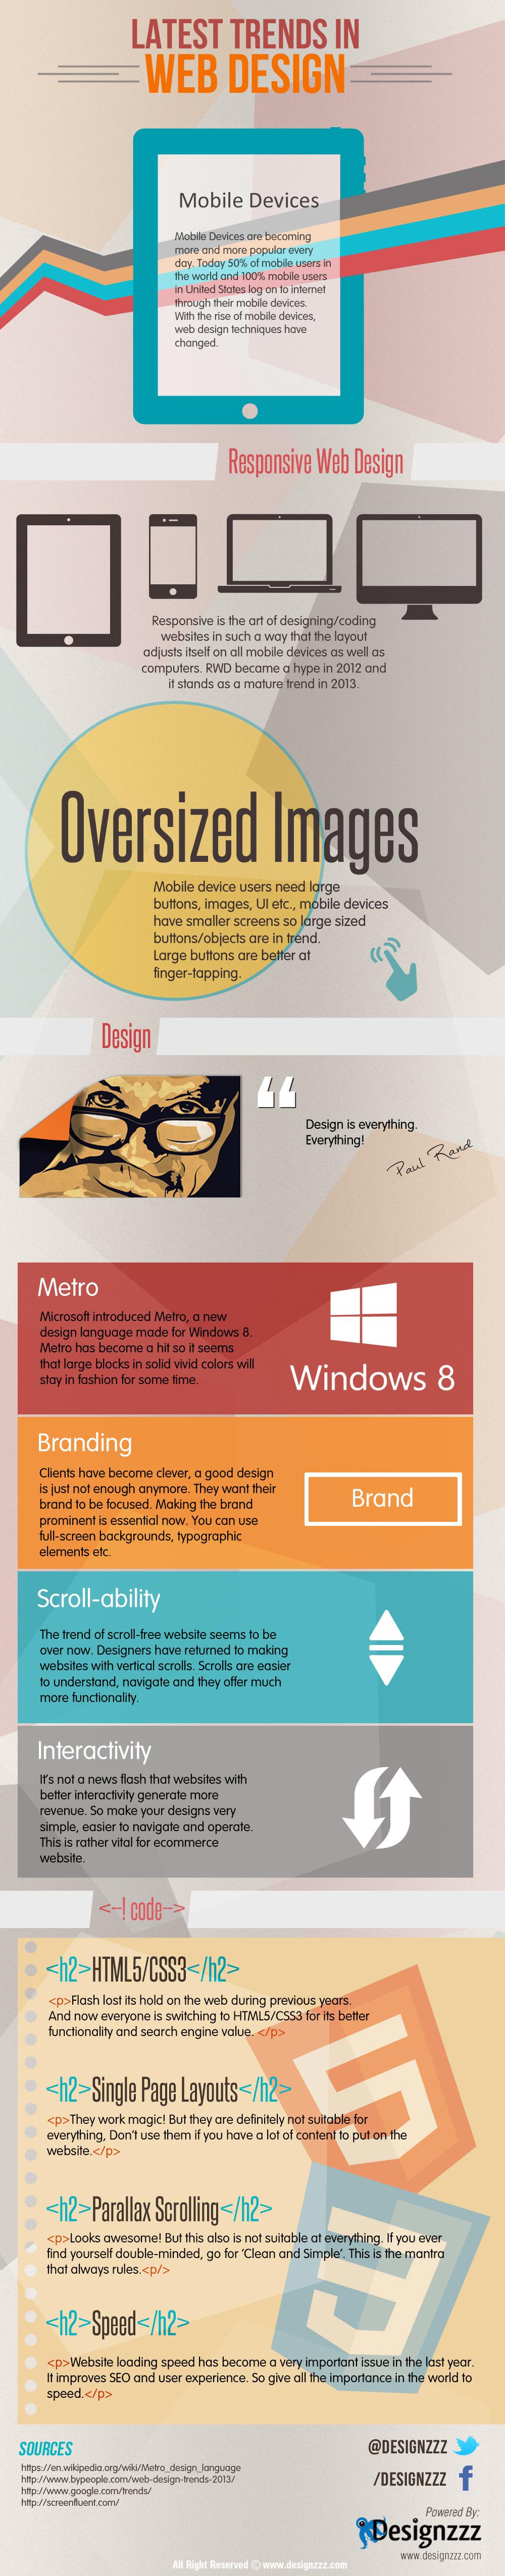 Latest Trends In Web Design Web Design Trends Web Design Web Design Tips